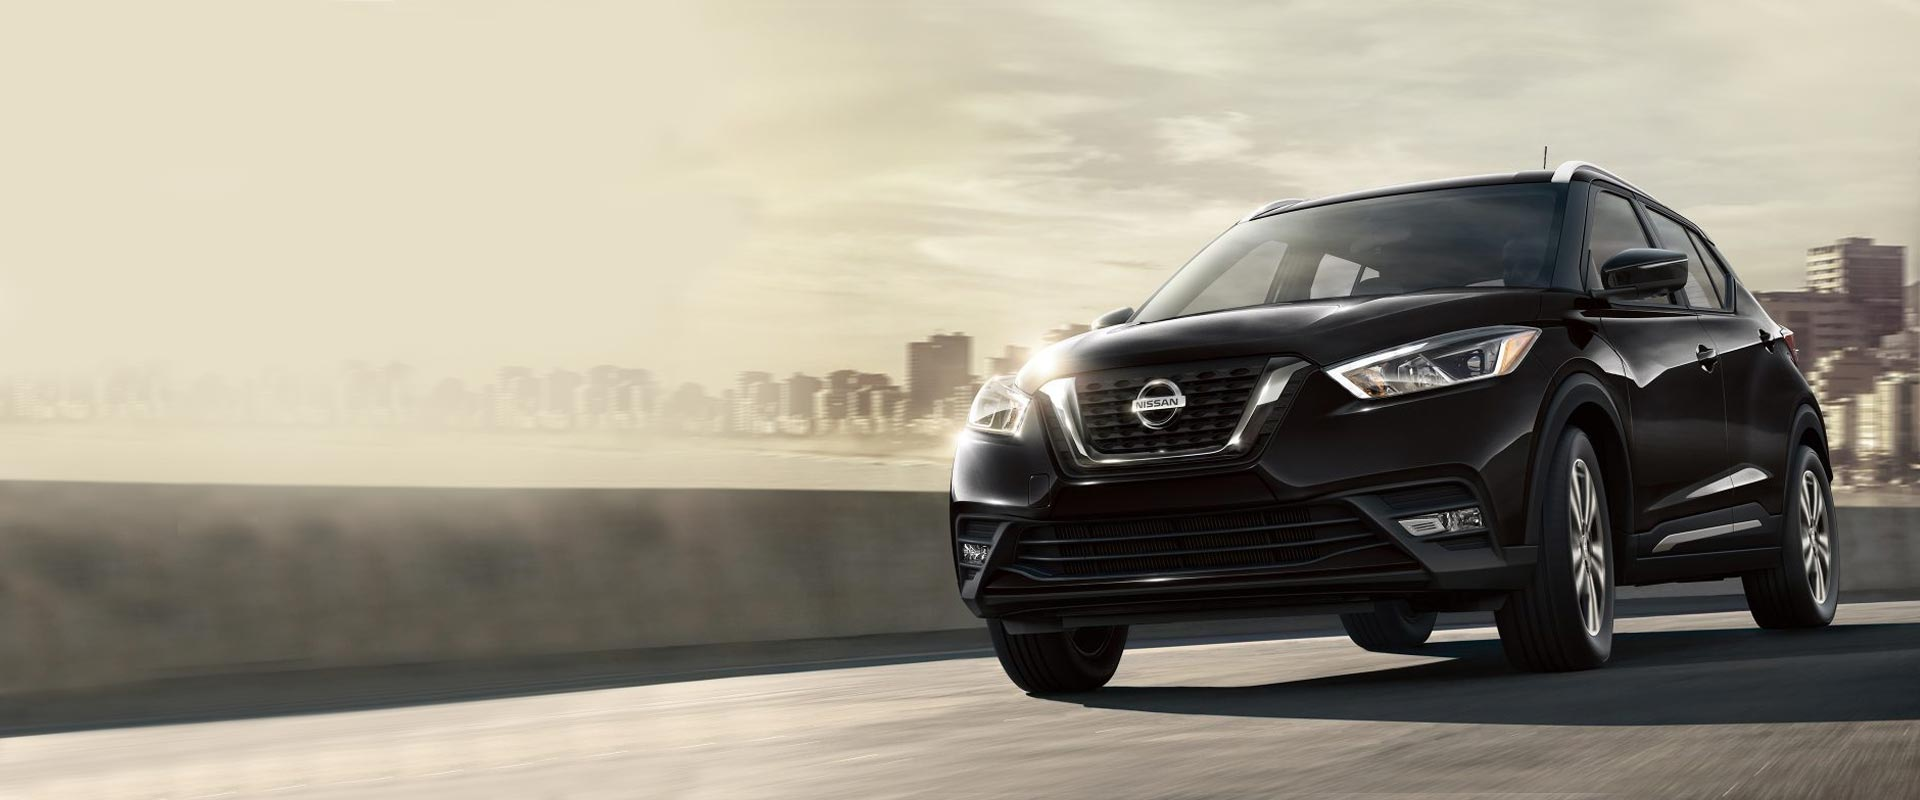 The Brand New 2018 Nissan Kicks™